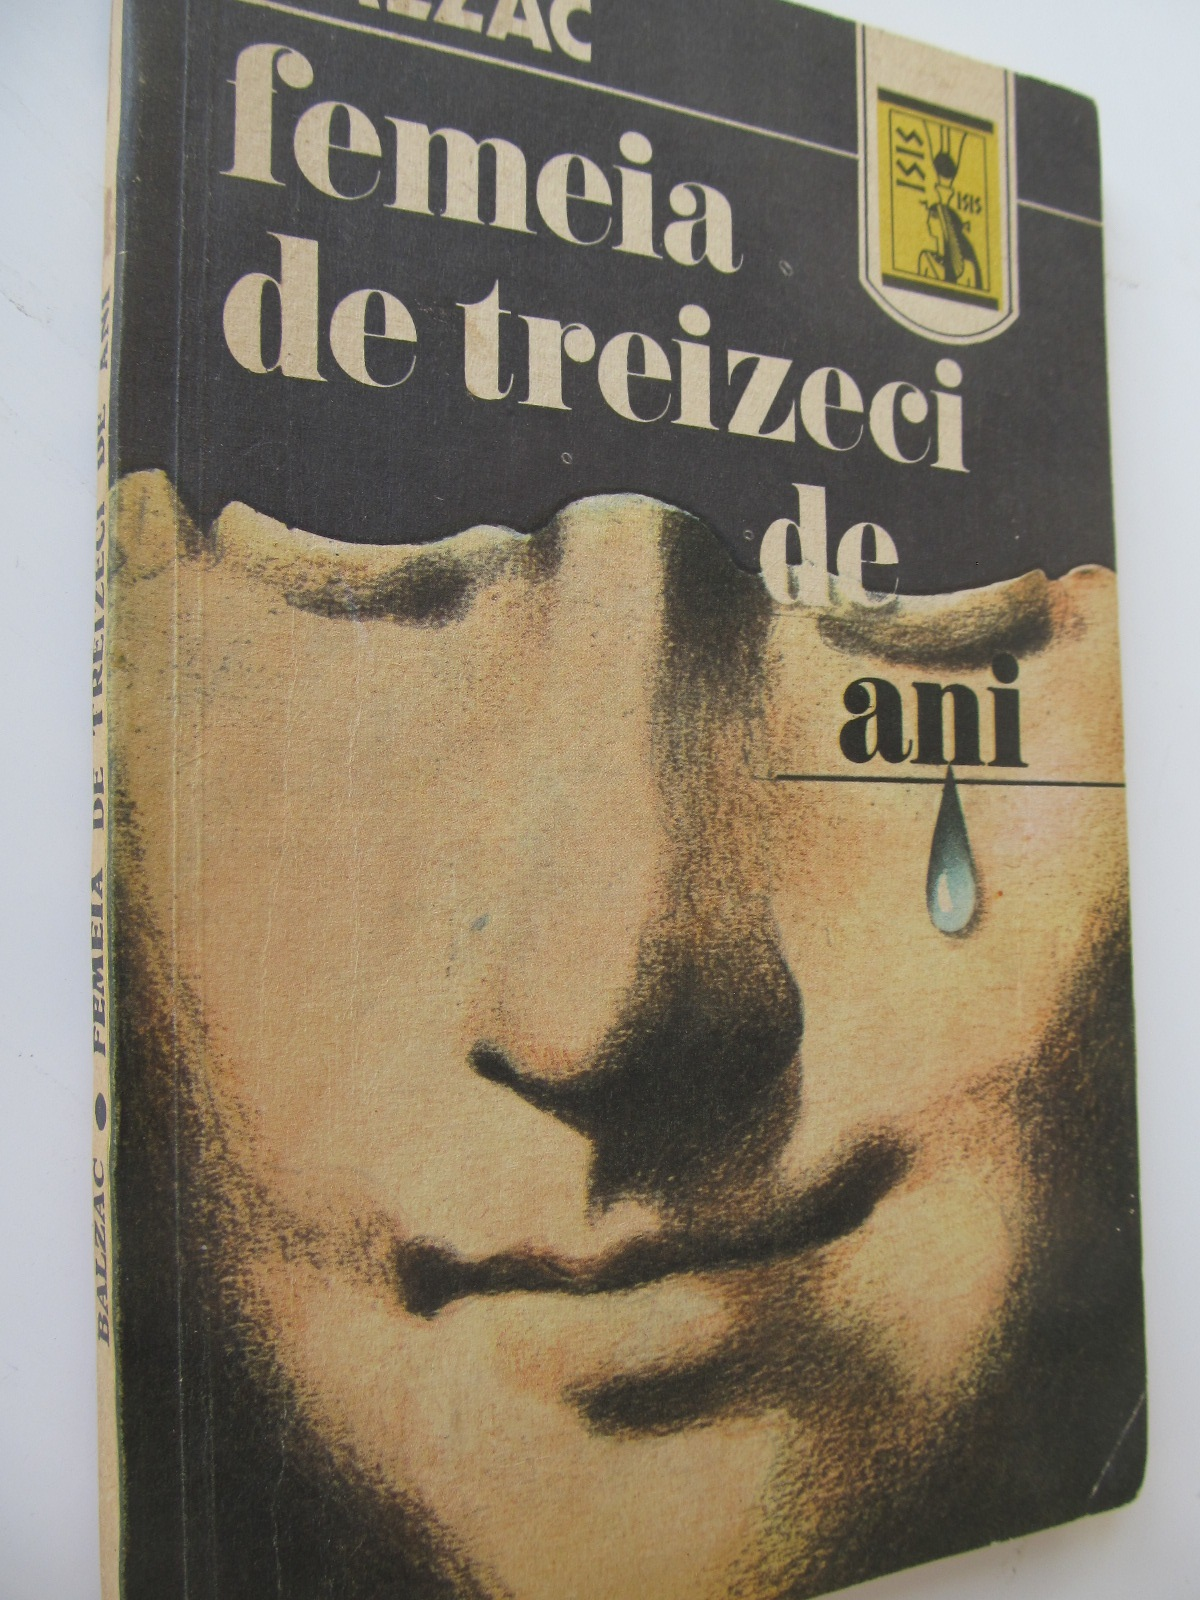 Femeia de treizeci de ani - Balzac | Detalii carte